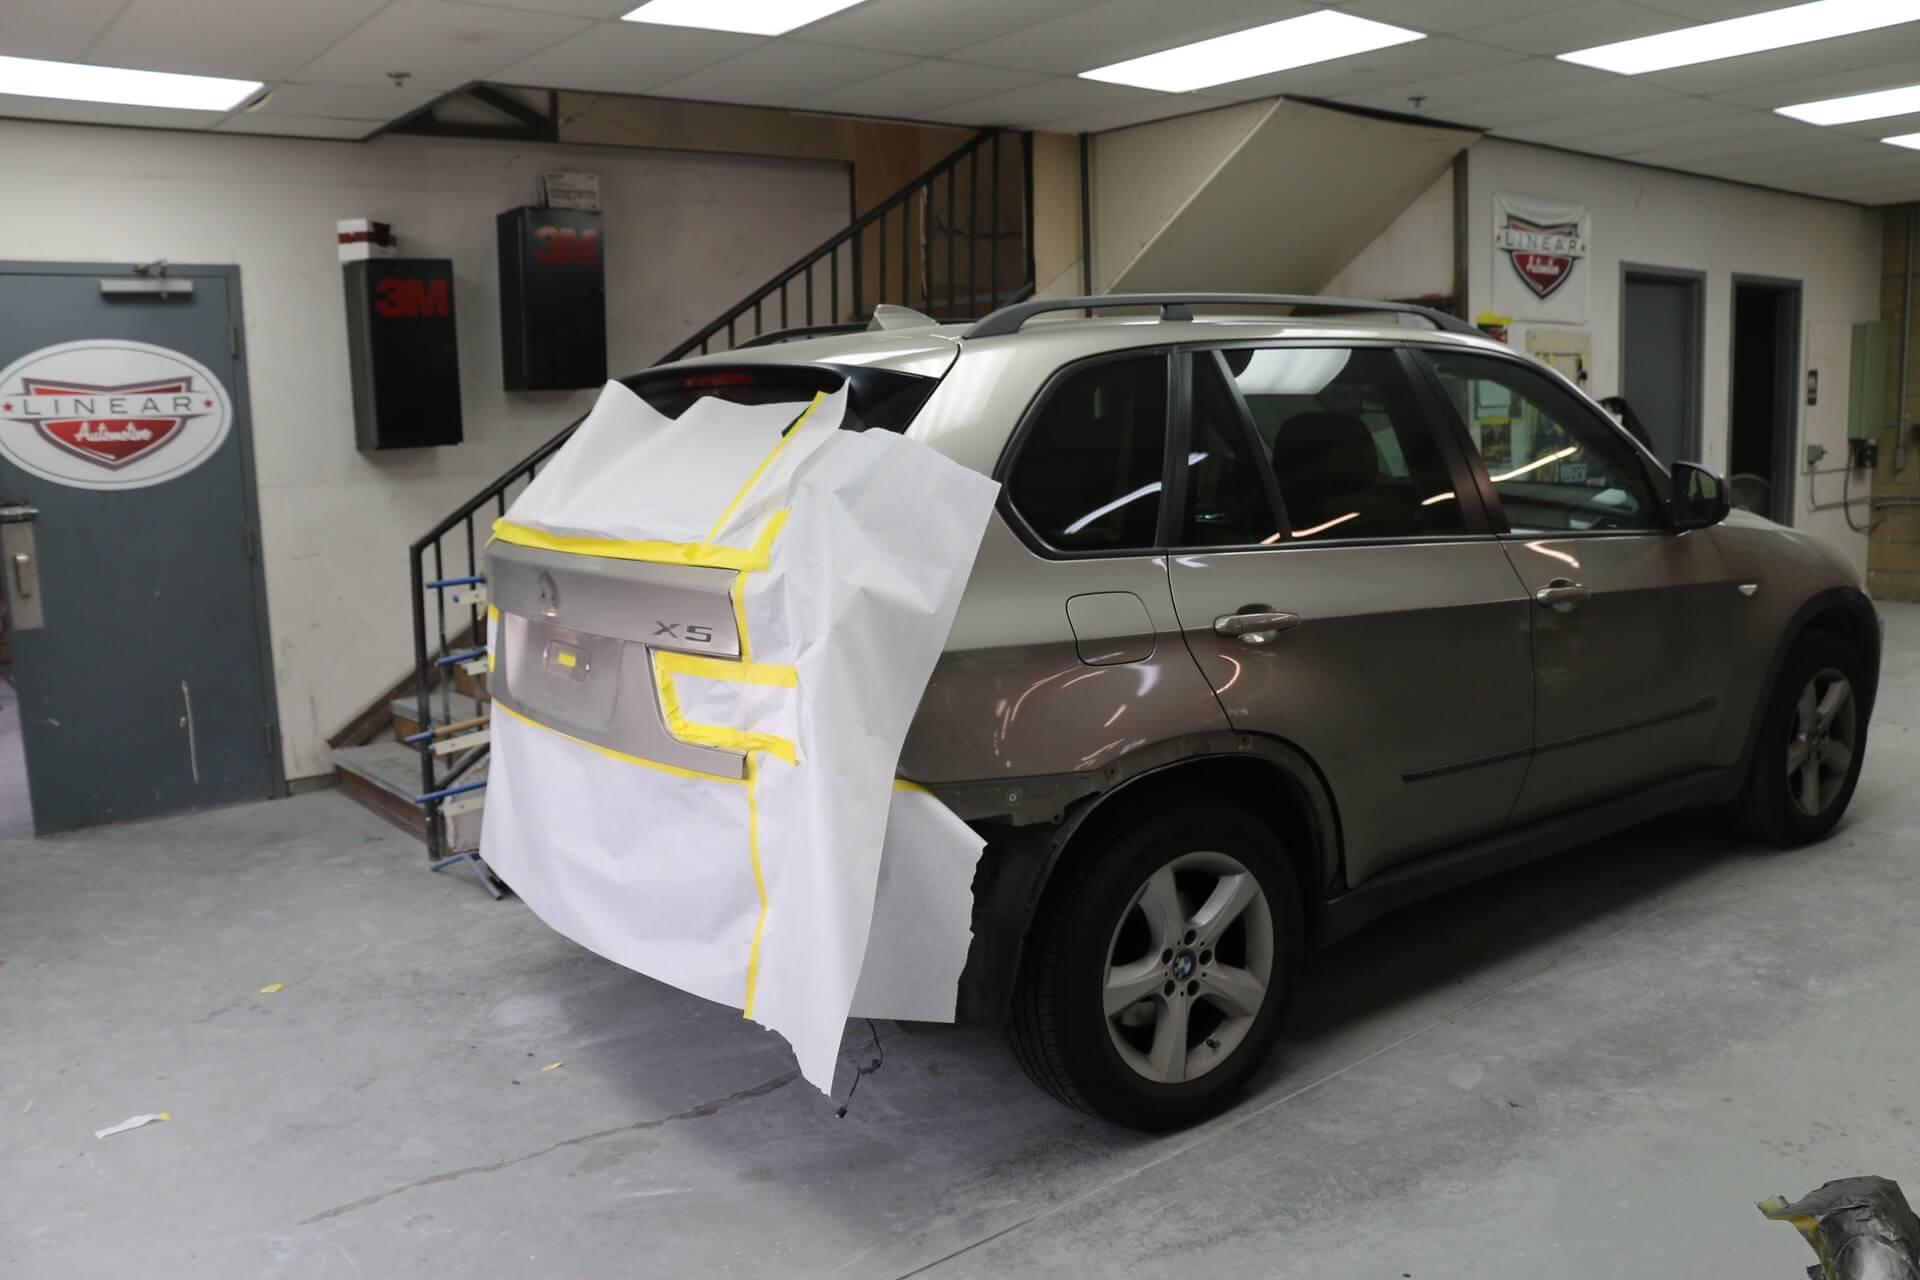 certified body shop suv liftgate repair service in plano dallas mckinney allen richardson frisco texas